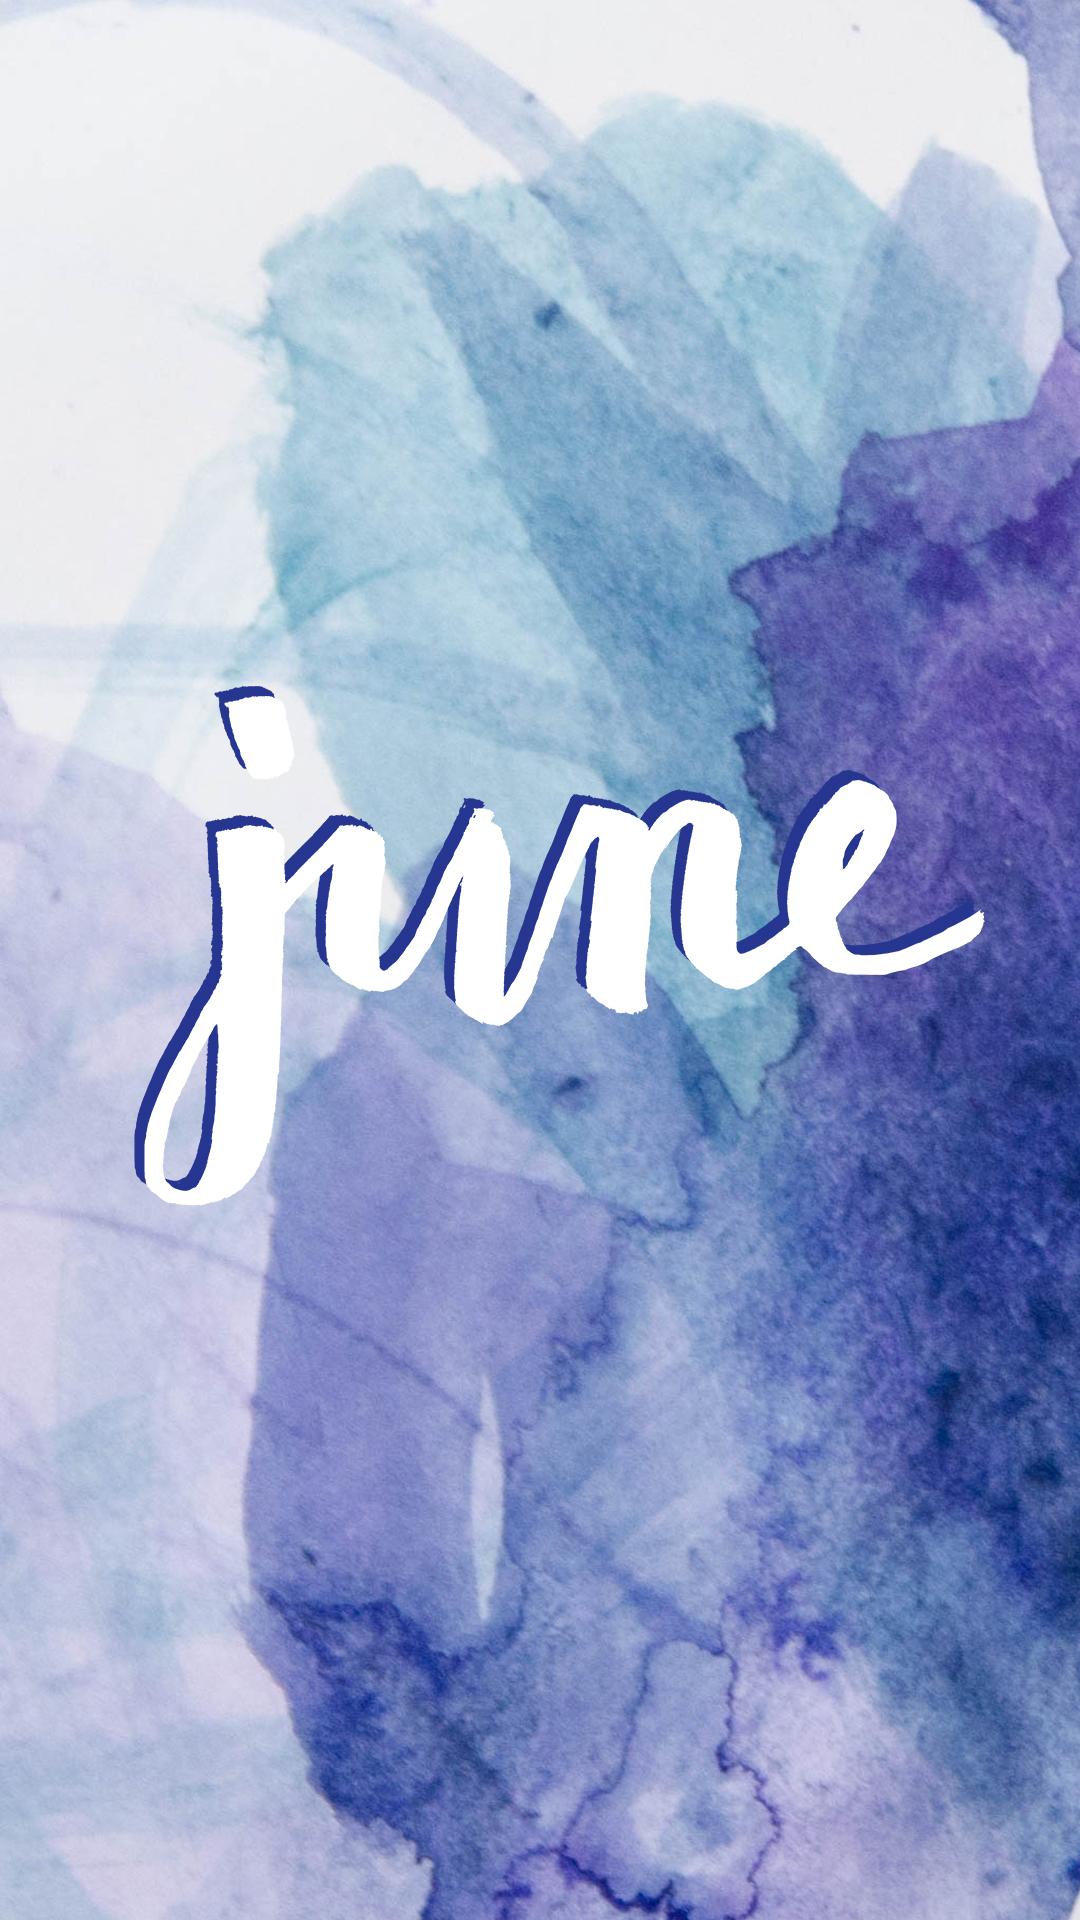 June Calendar Desktop Wallpaper : By doing what you love tech wallpapers for june lemon